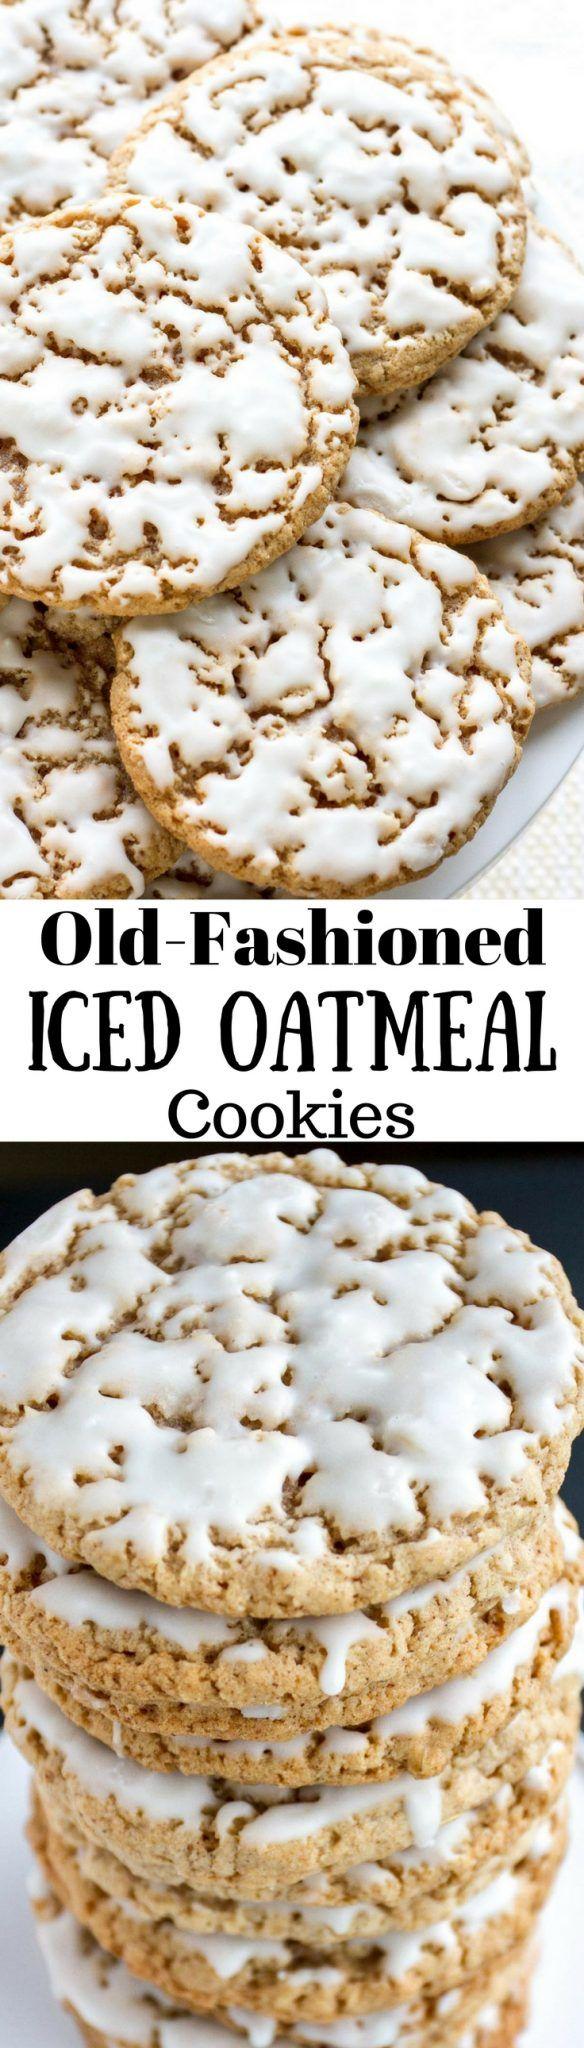 426 best Cookie Jar images on Pinterest | Cookies, Cookie recipes ...